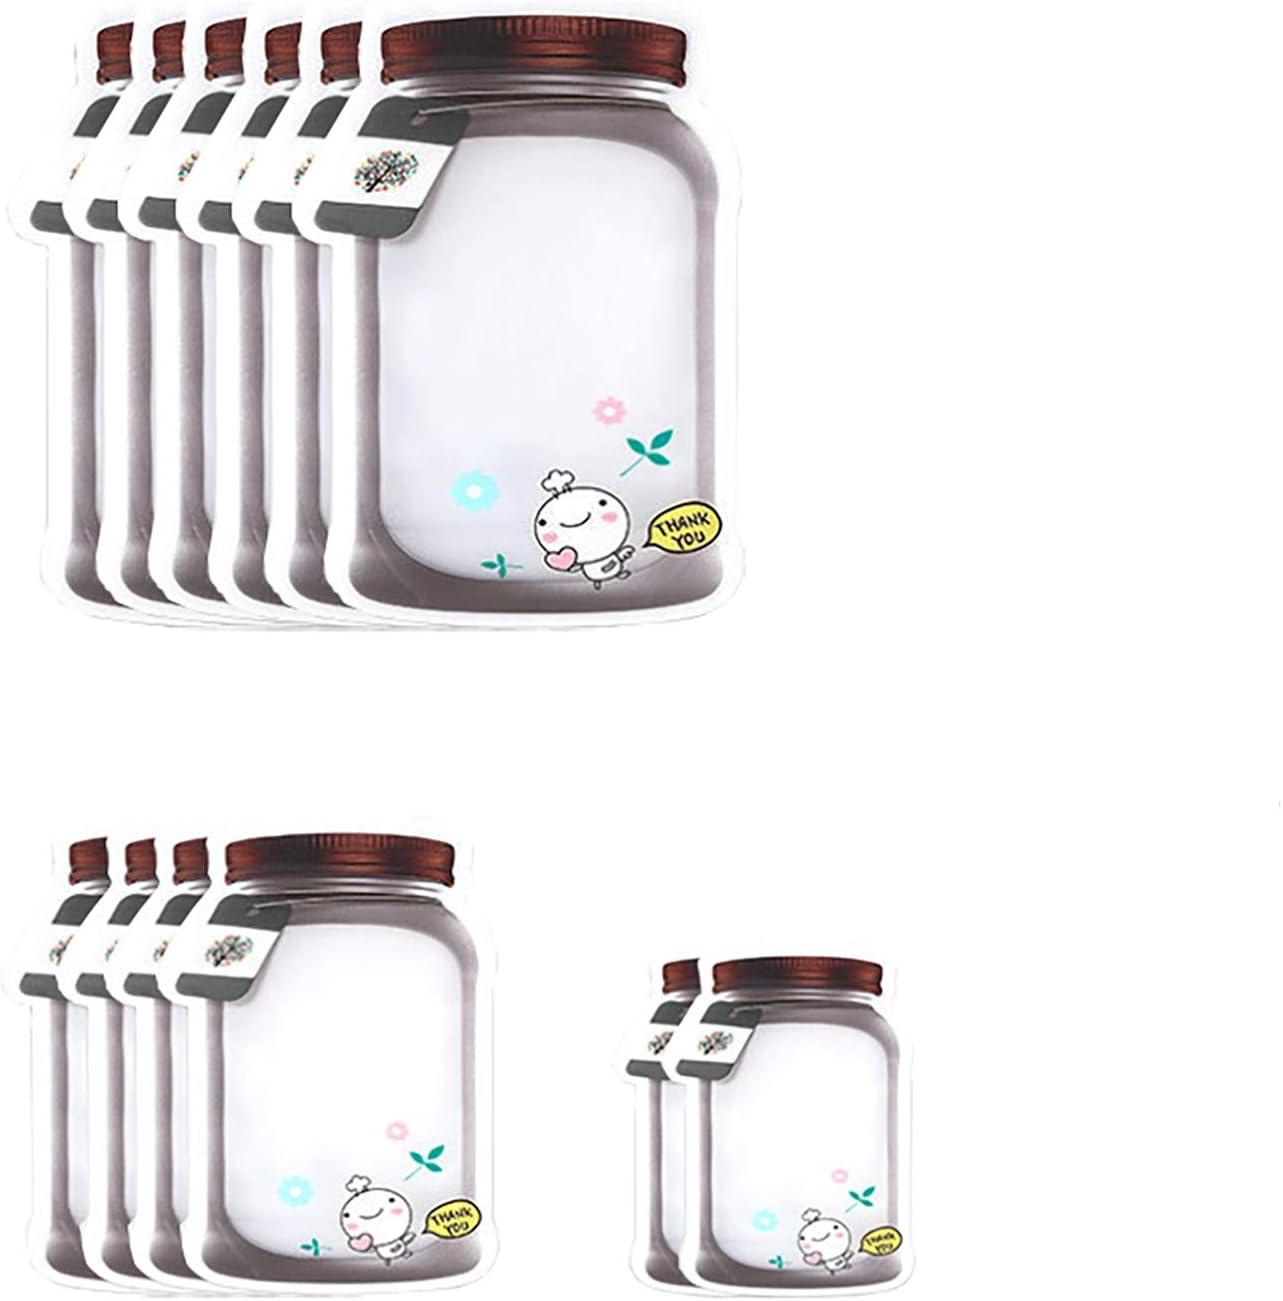 Enkrio Reusable Mason Jar Ziplock Bags Reusable Food Storage Bags for Kid Snack Sandwich Leak-Proof for Kitchen Travel Camping Picnic Organizer Mason Jars Storage Bags 12Pack (6Large, 4Medium, 2Small)